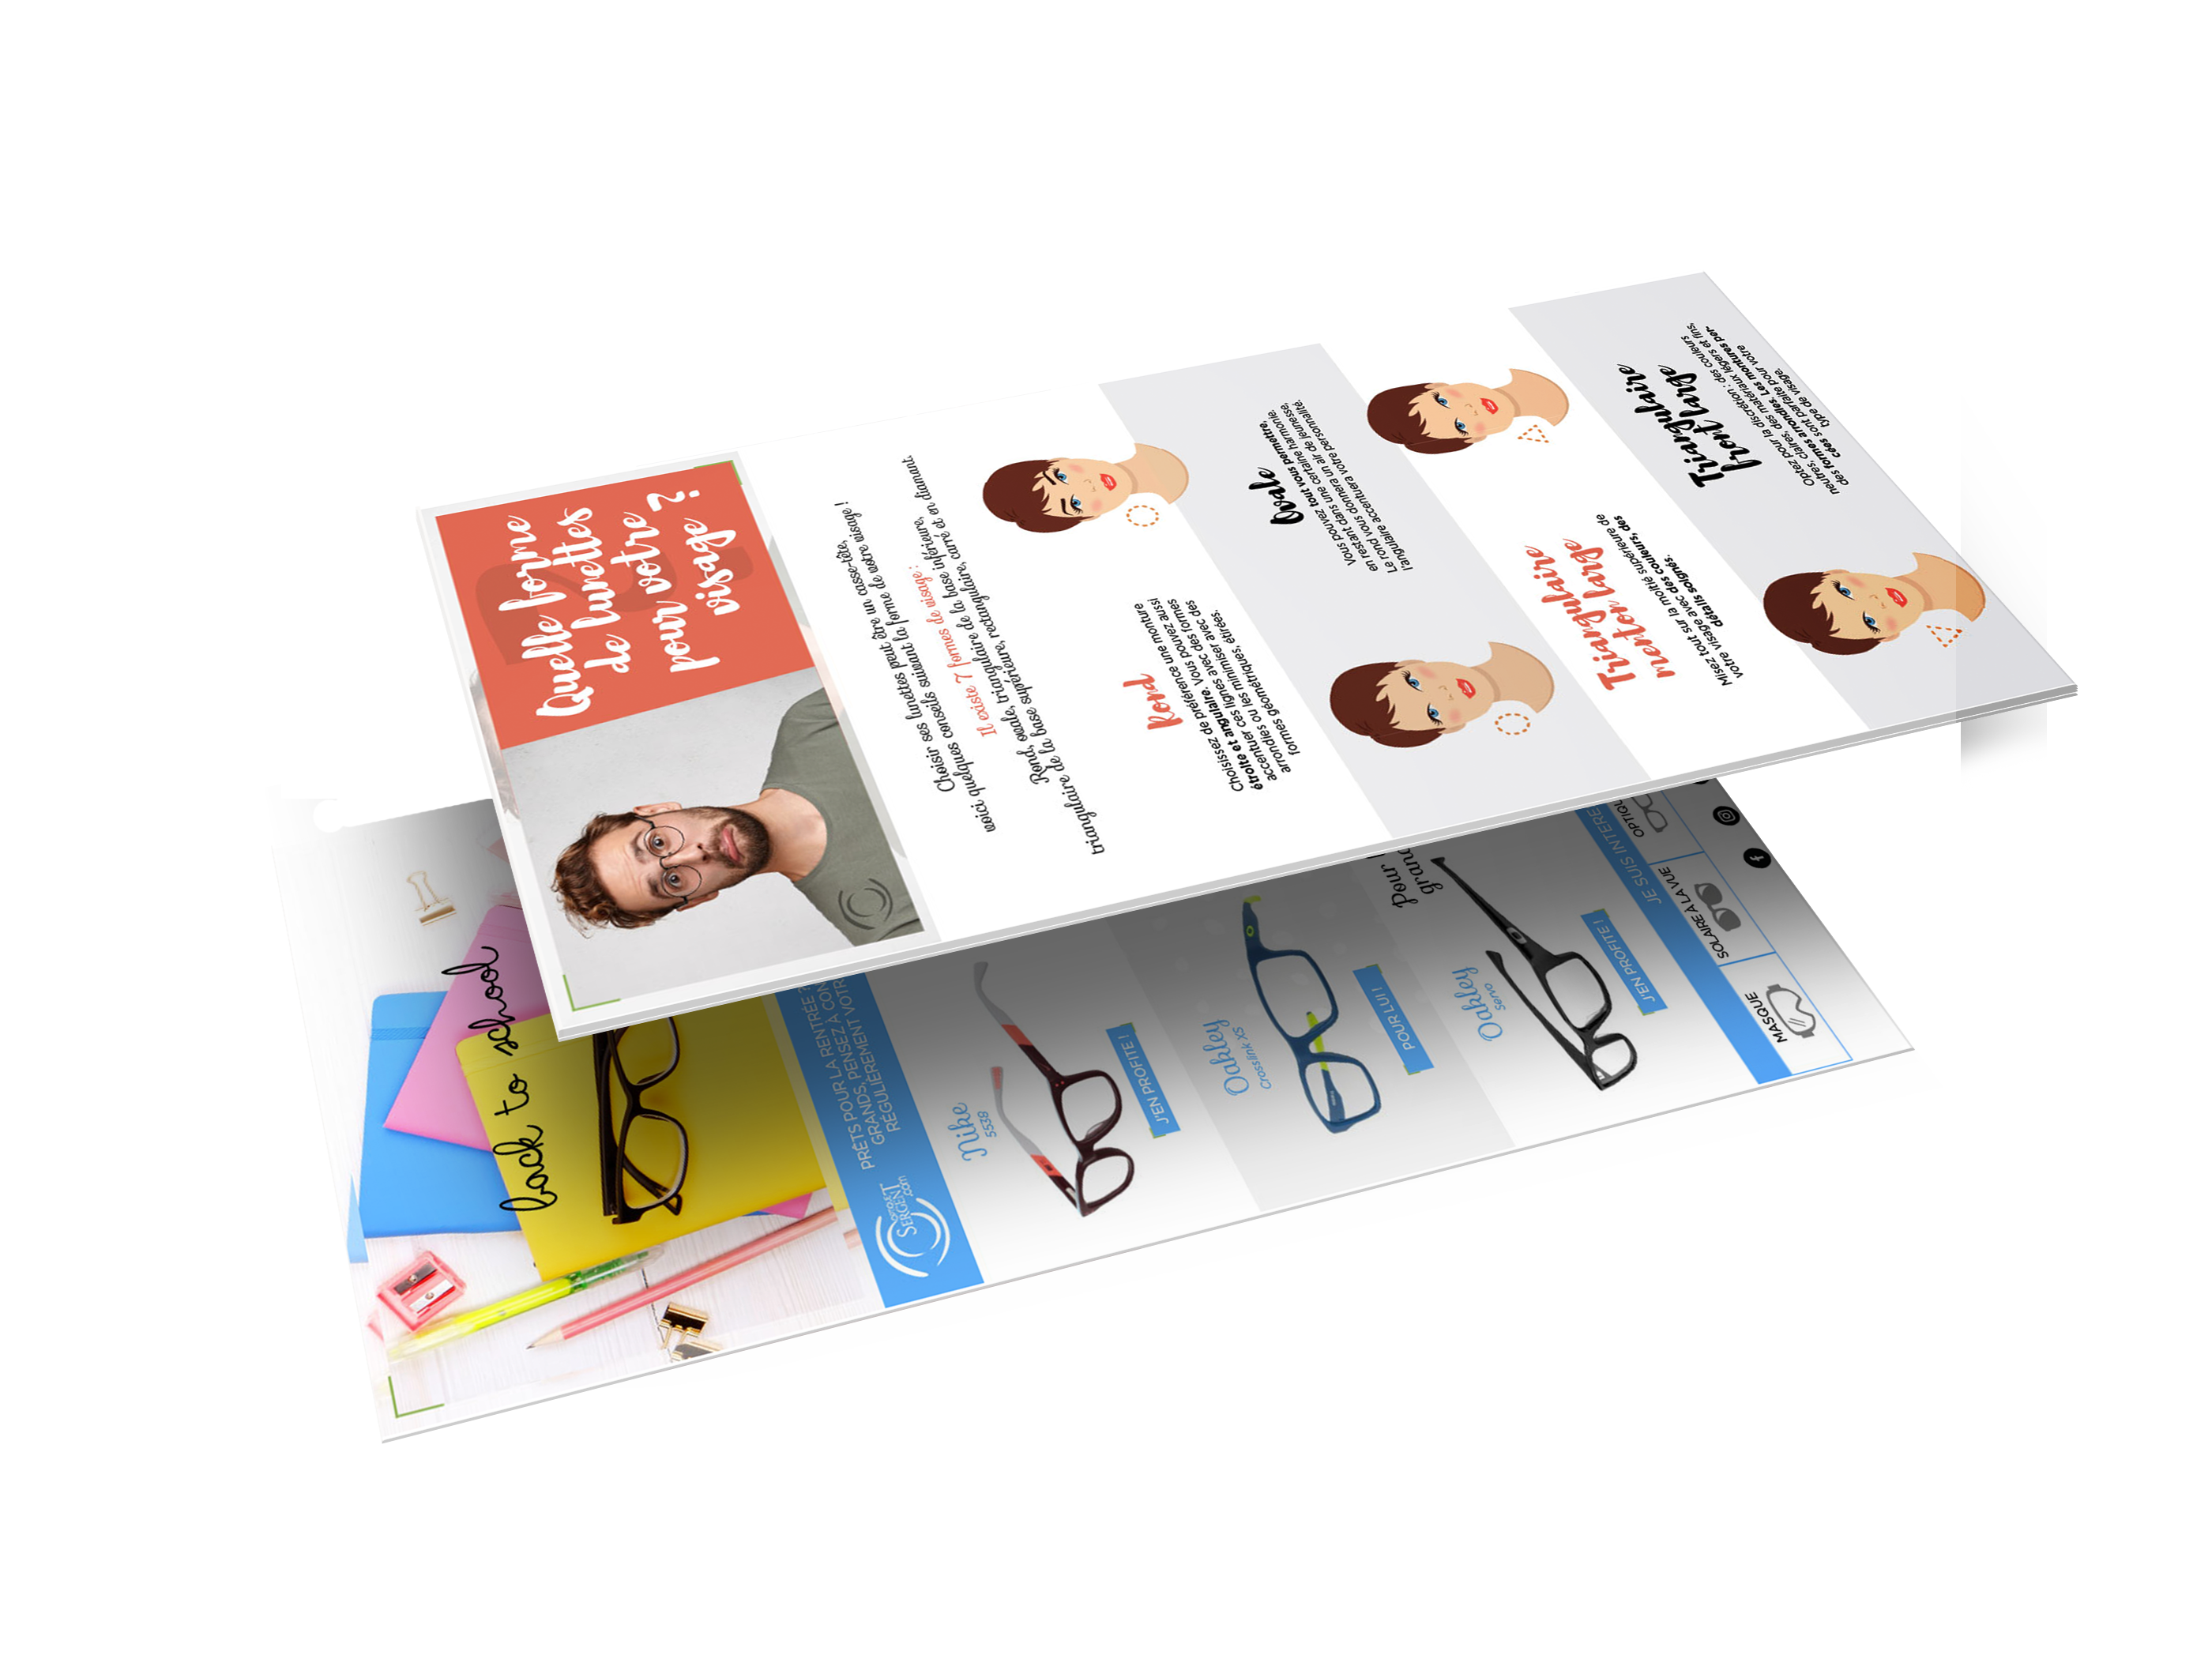 Creative Altitude - Agence Communication - Savoie - site-internet - logo - web - print - Newsletter Optique Sergent